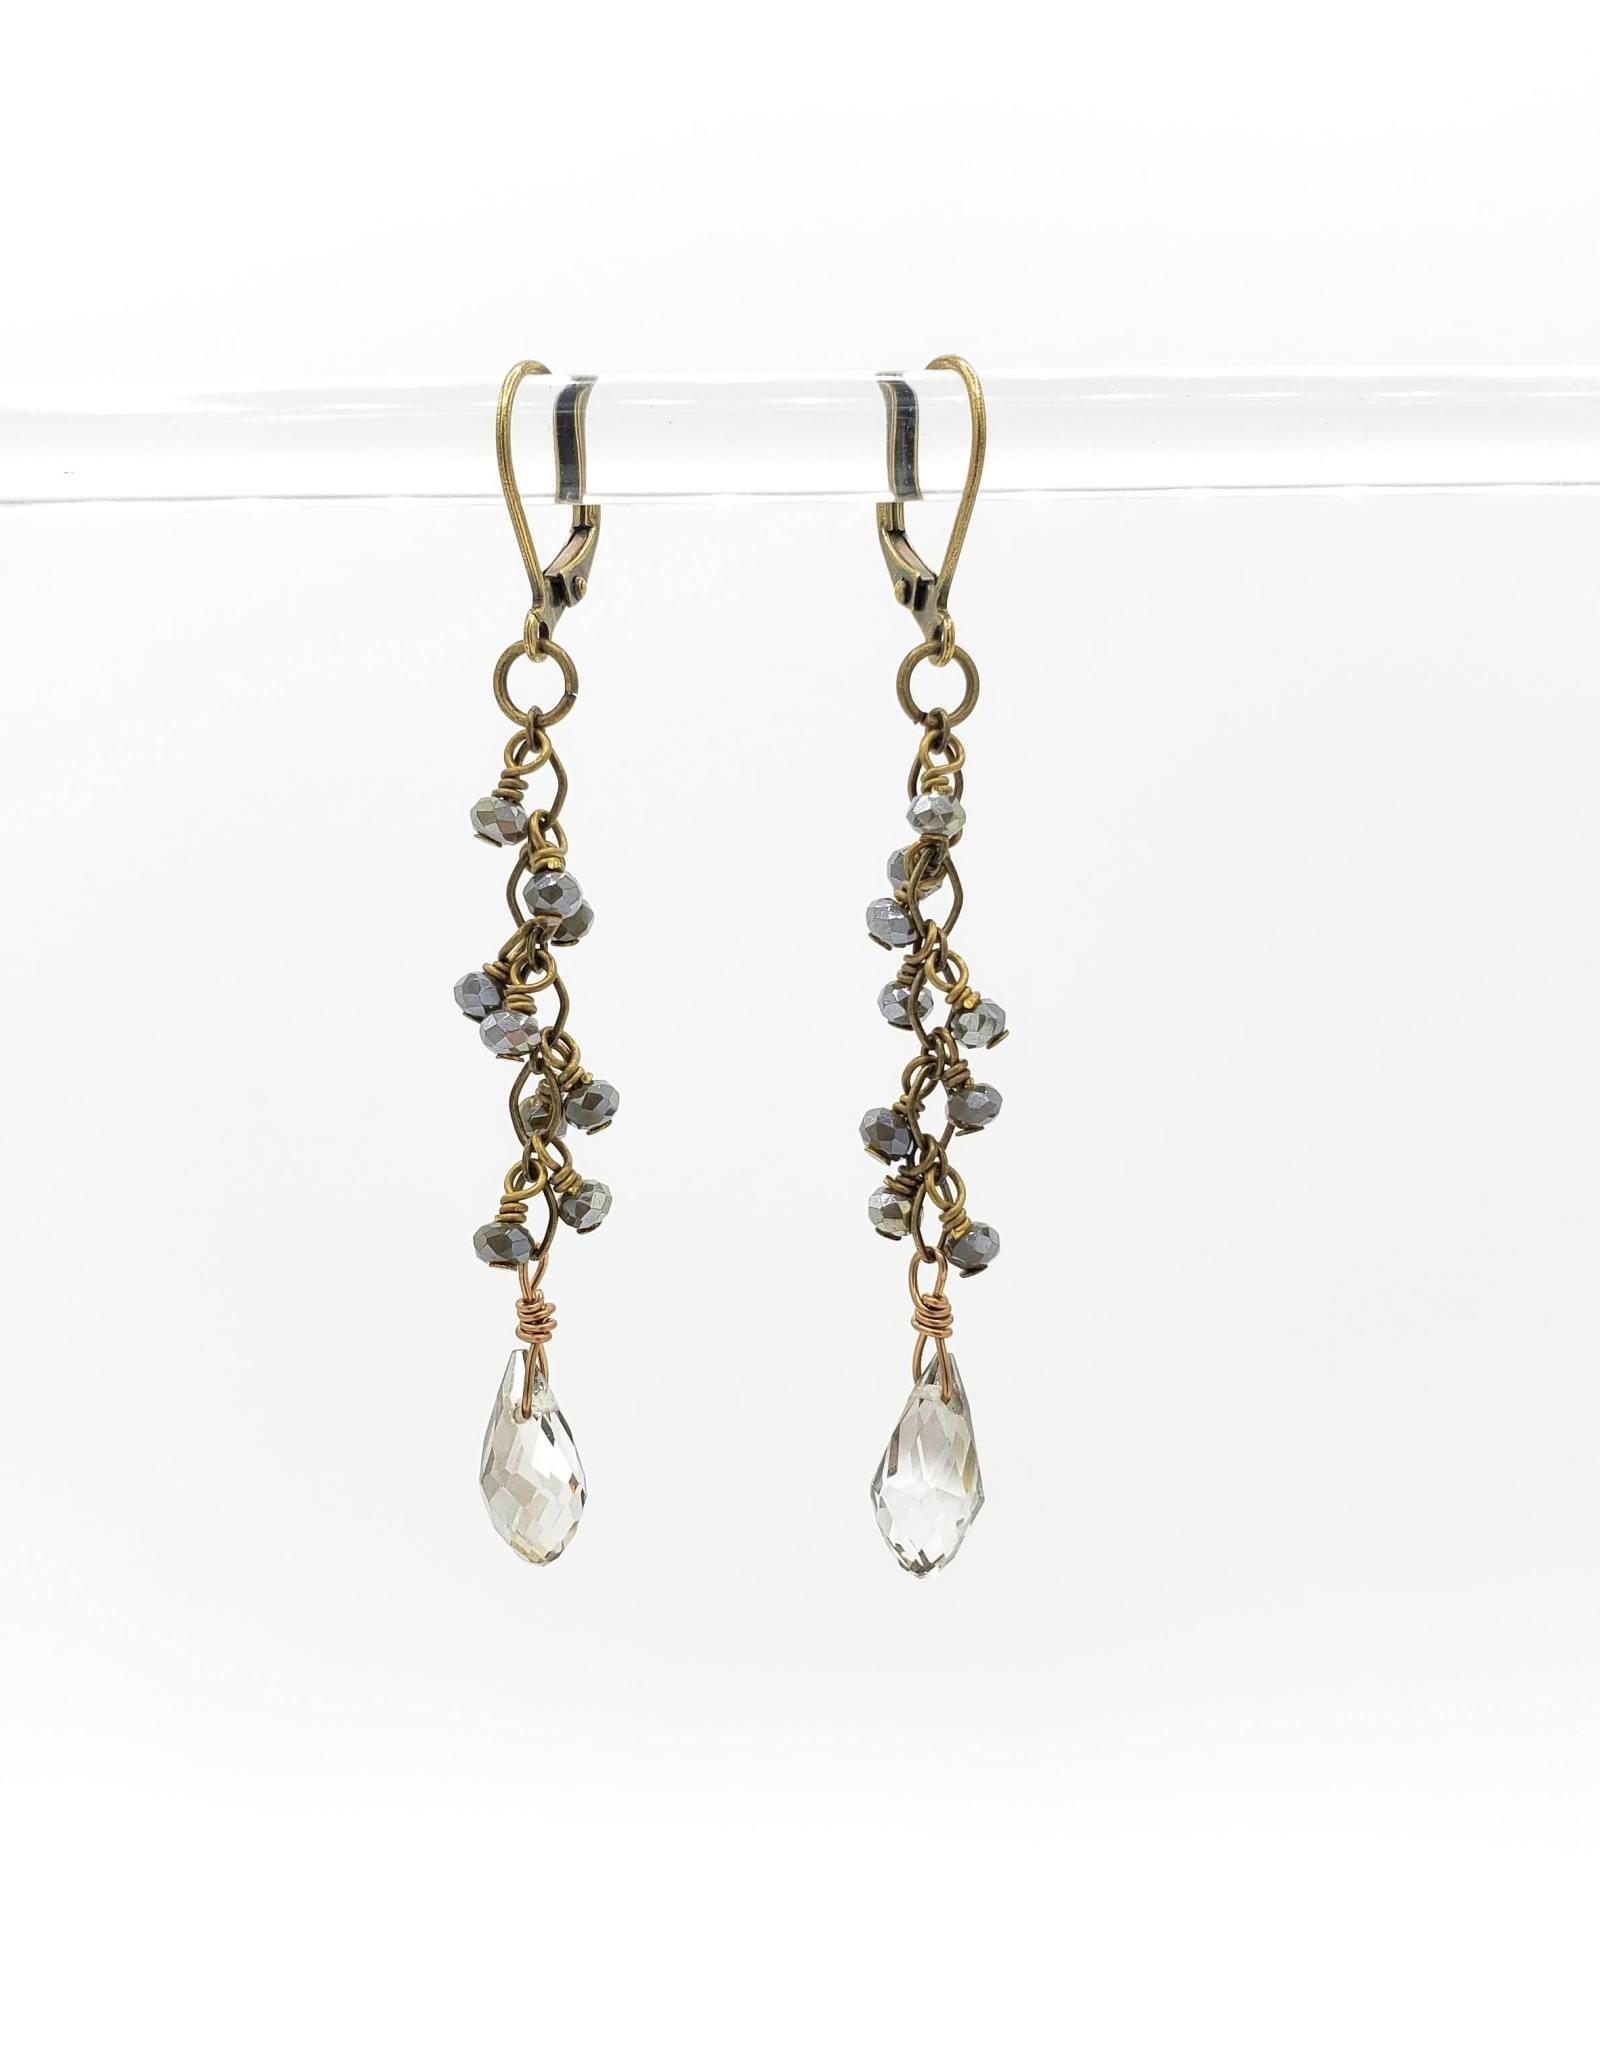 Dark Jasper and Champagne Briolette Drop Earrings